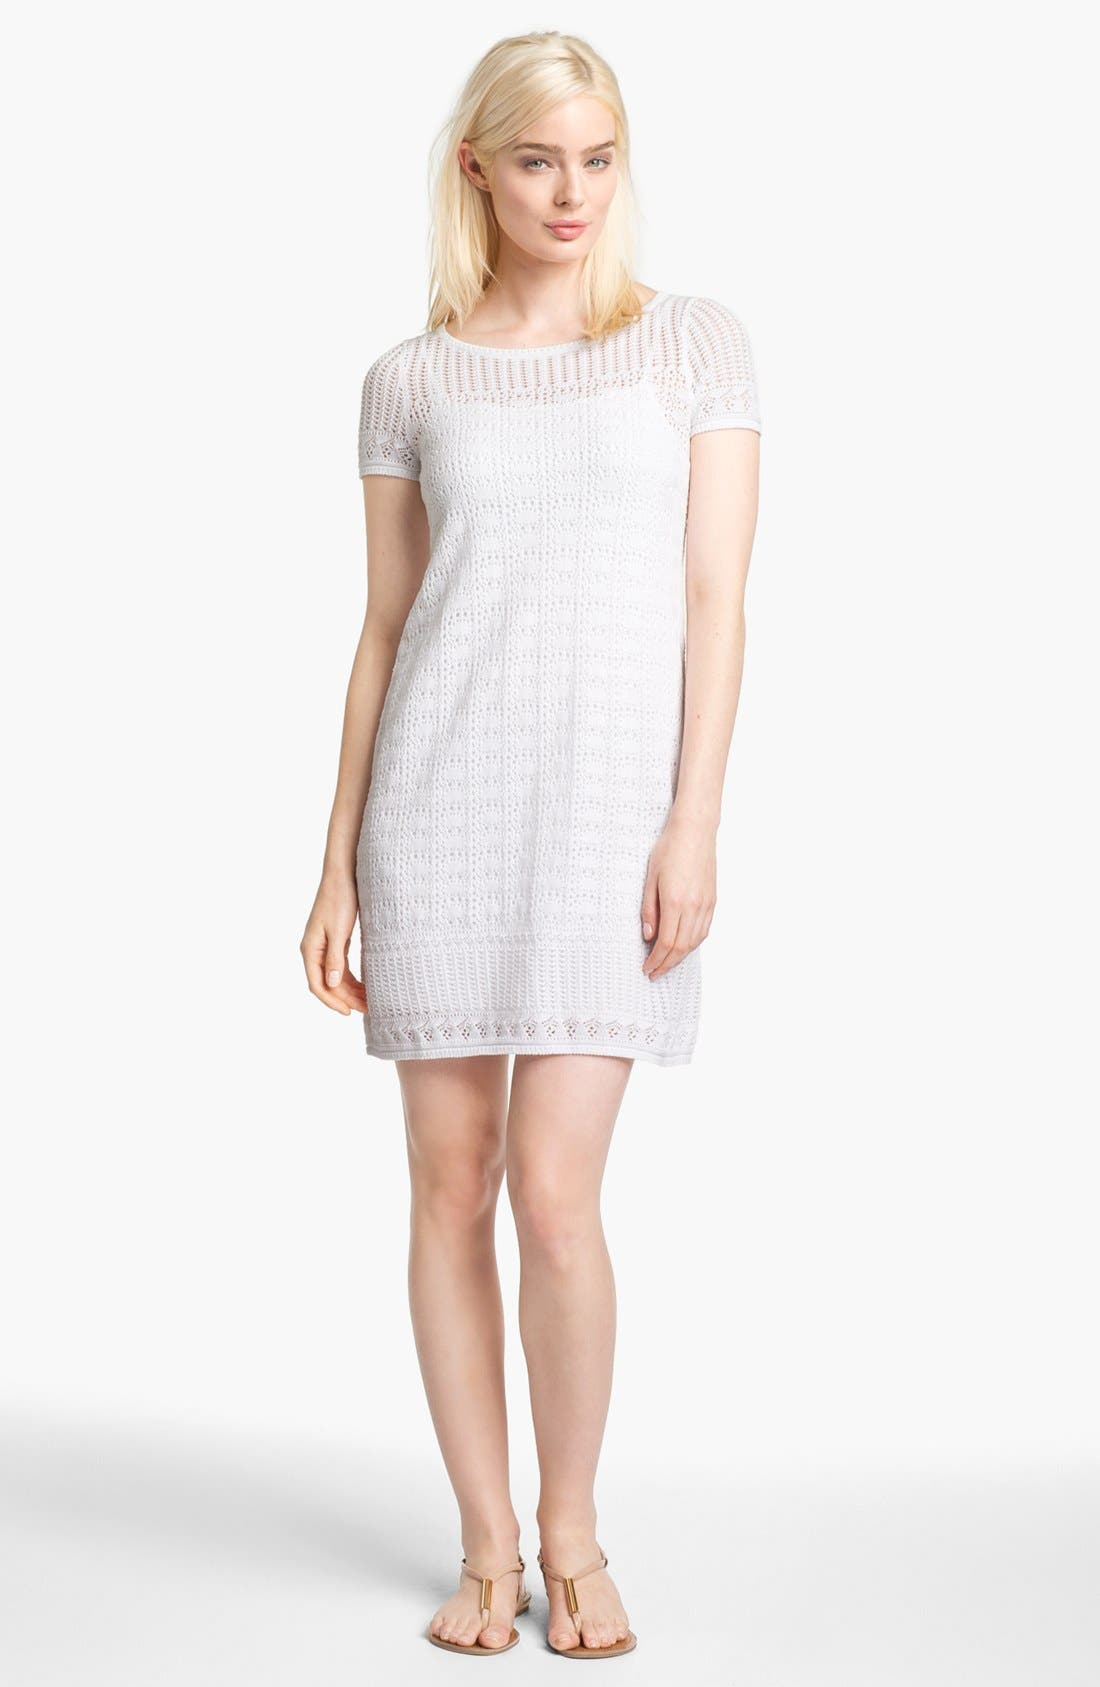 Alternate Image 1 Selected - Lilly Pulitzer® 'Paula' Crochet Sweater Shift Dress